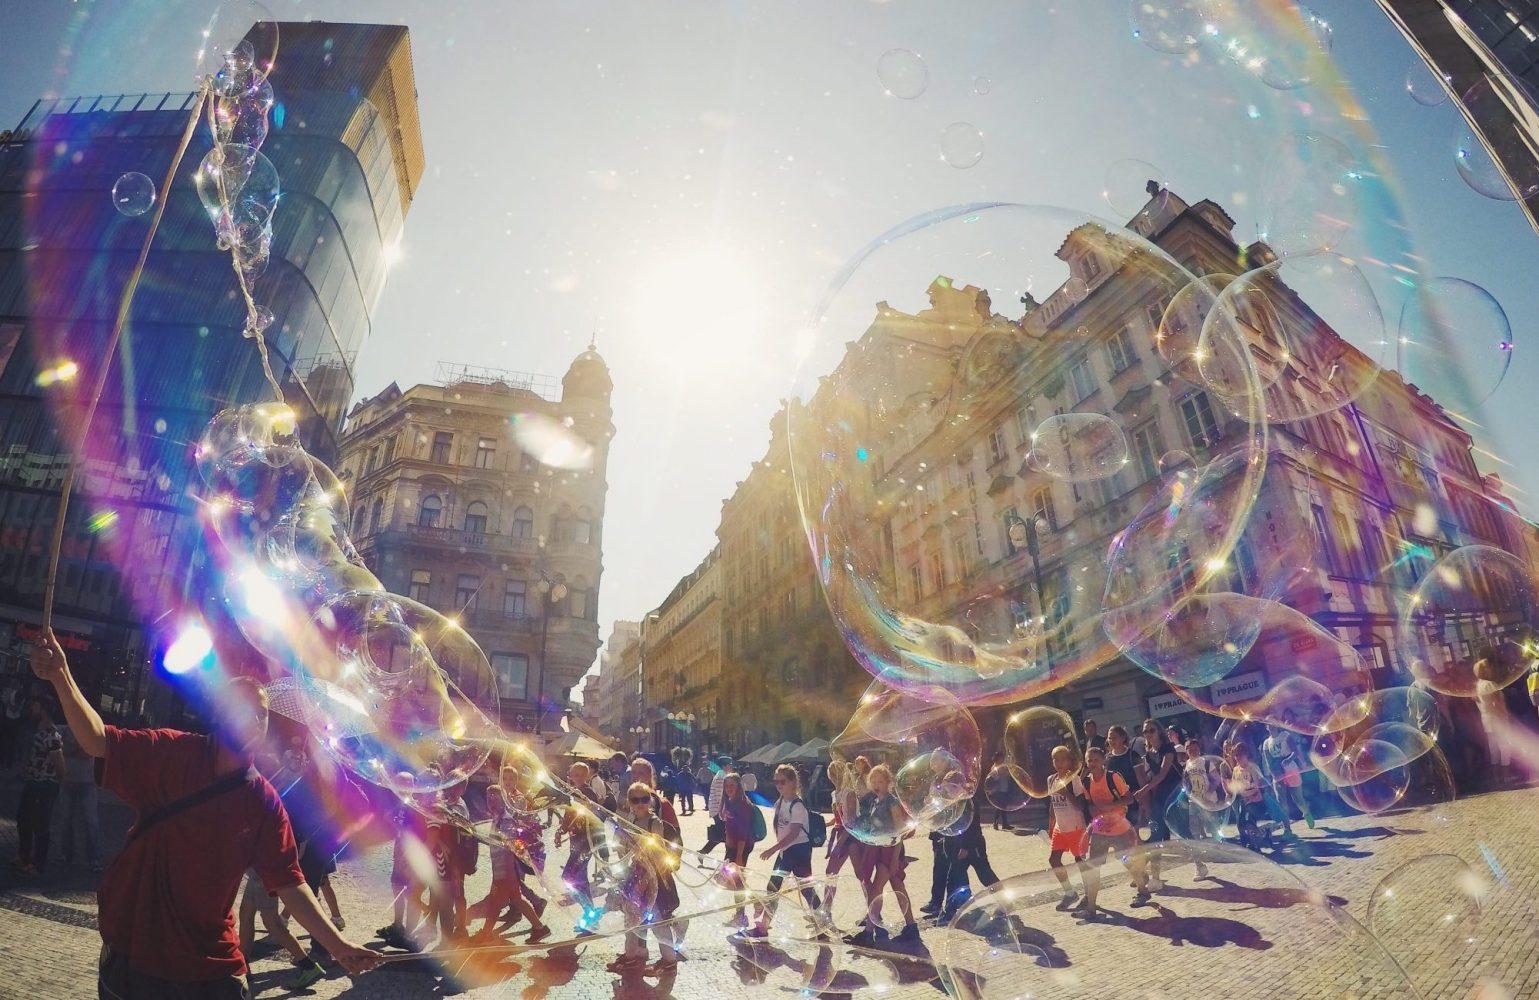 vitality-joy-meaning